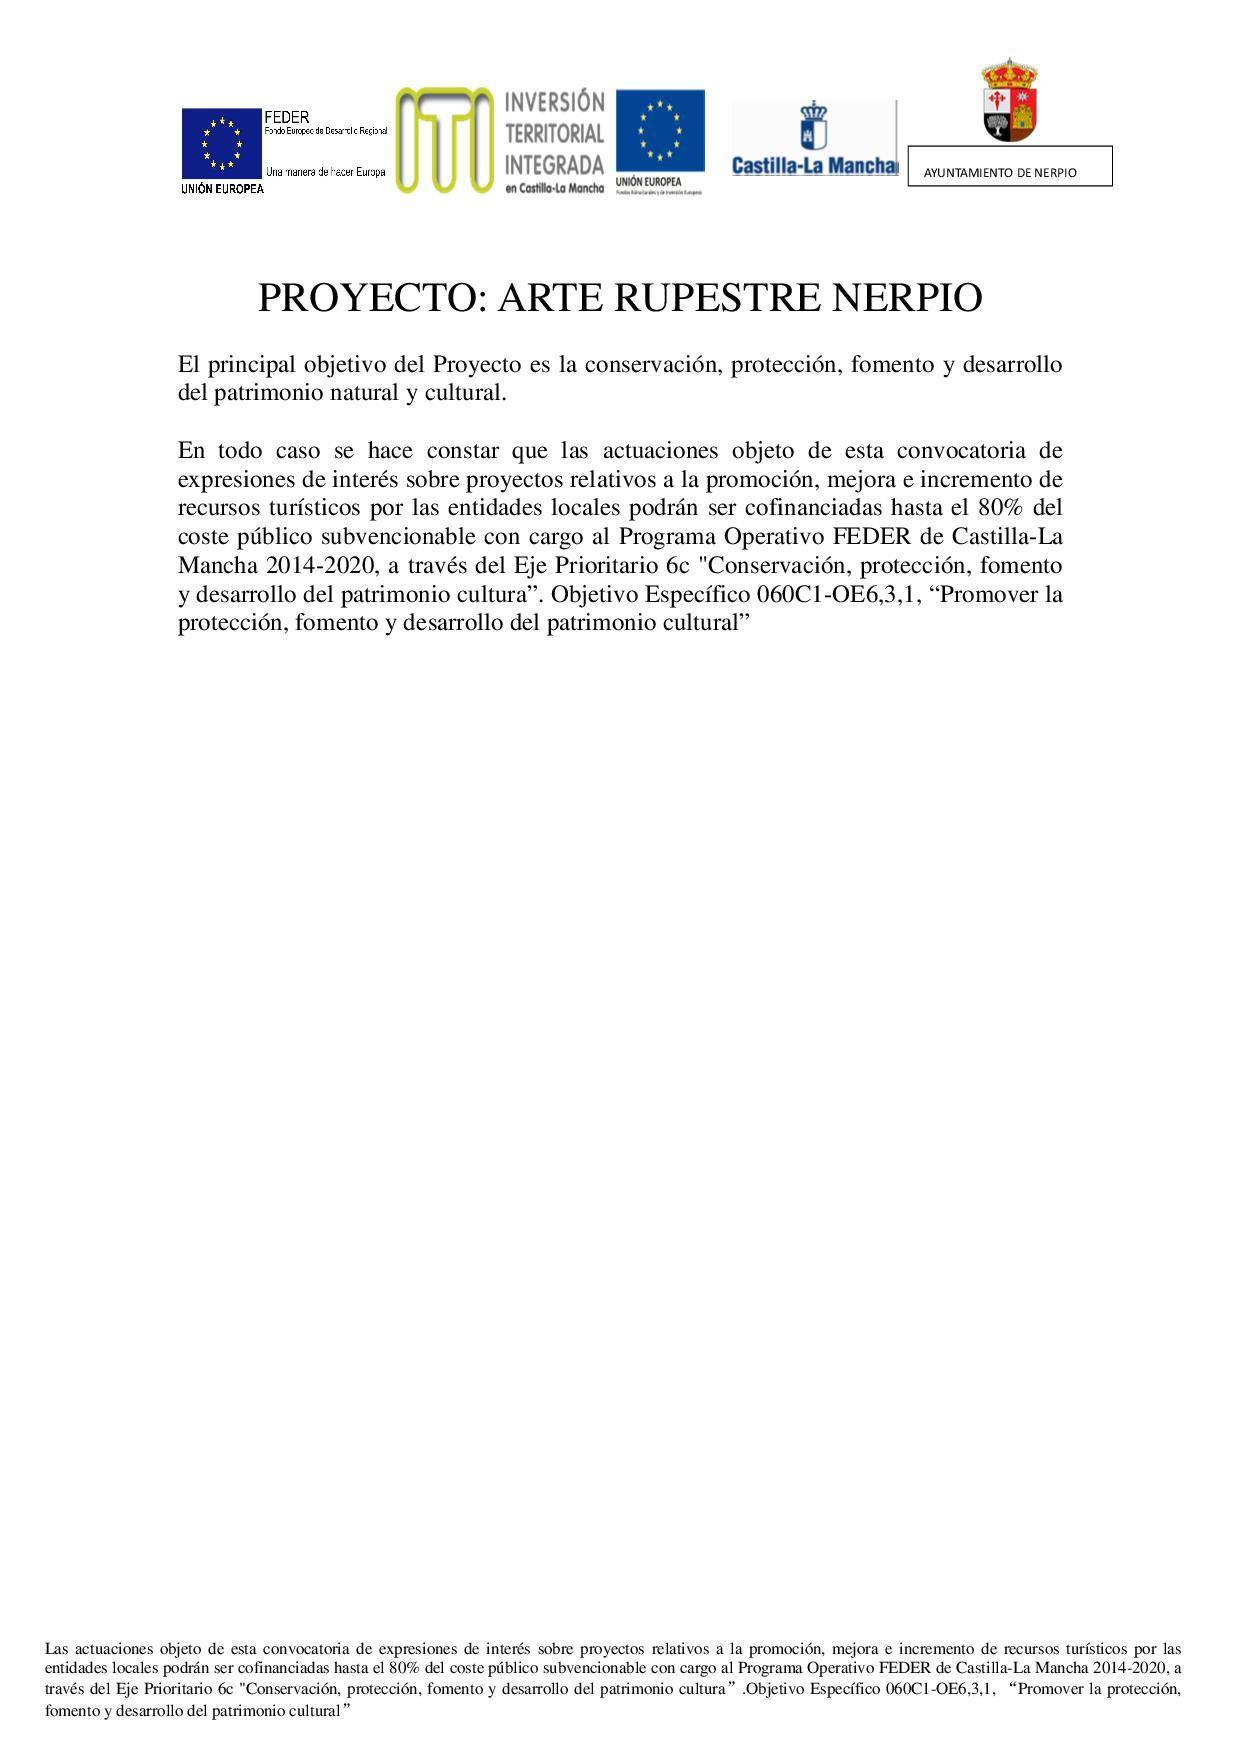 PROYECTO ARTE RUPESTRE NERPIO